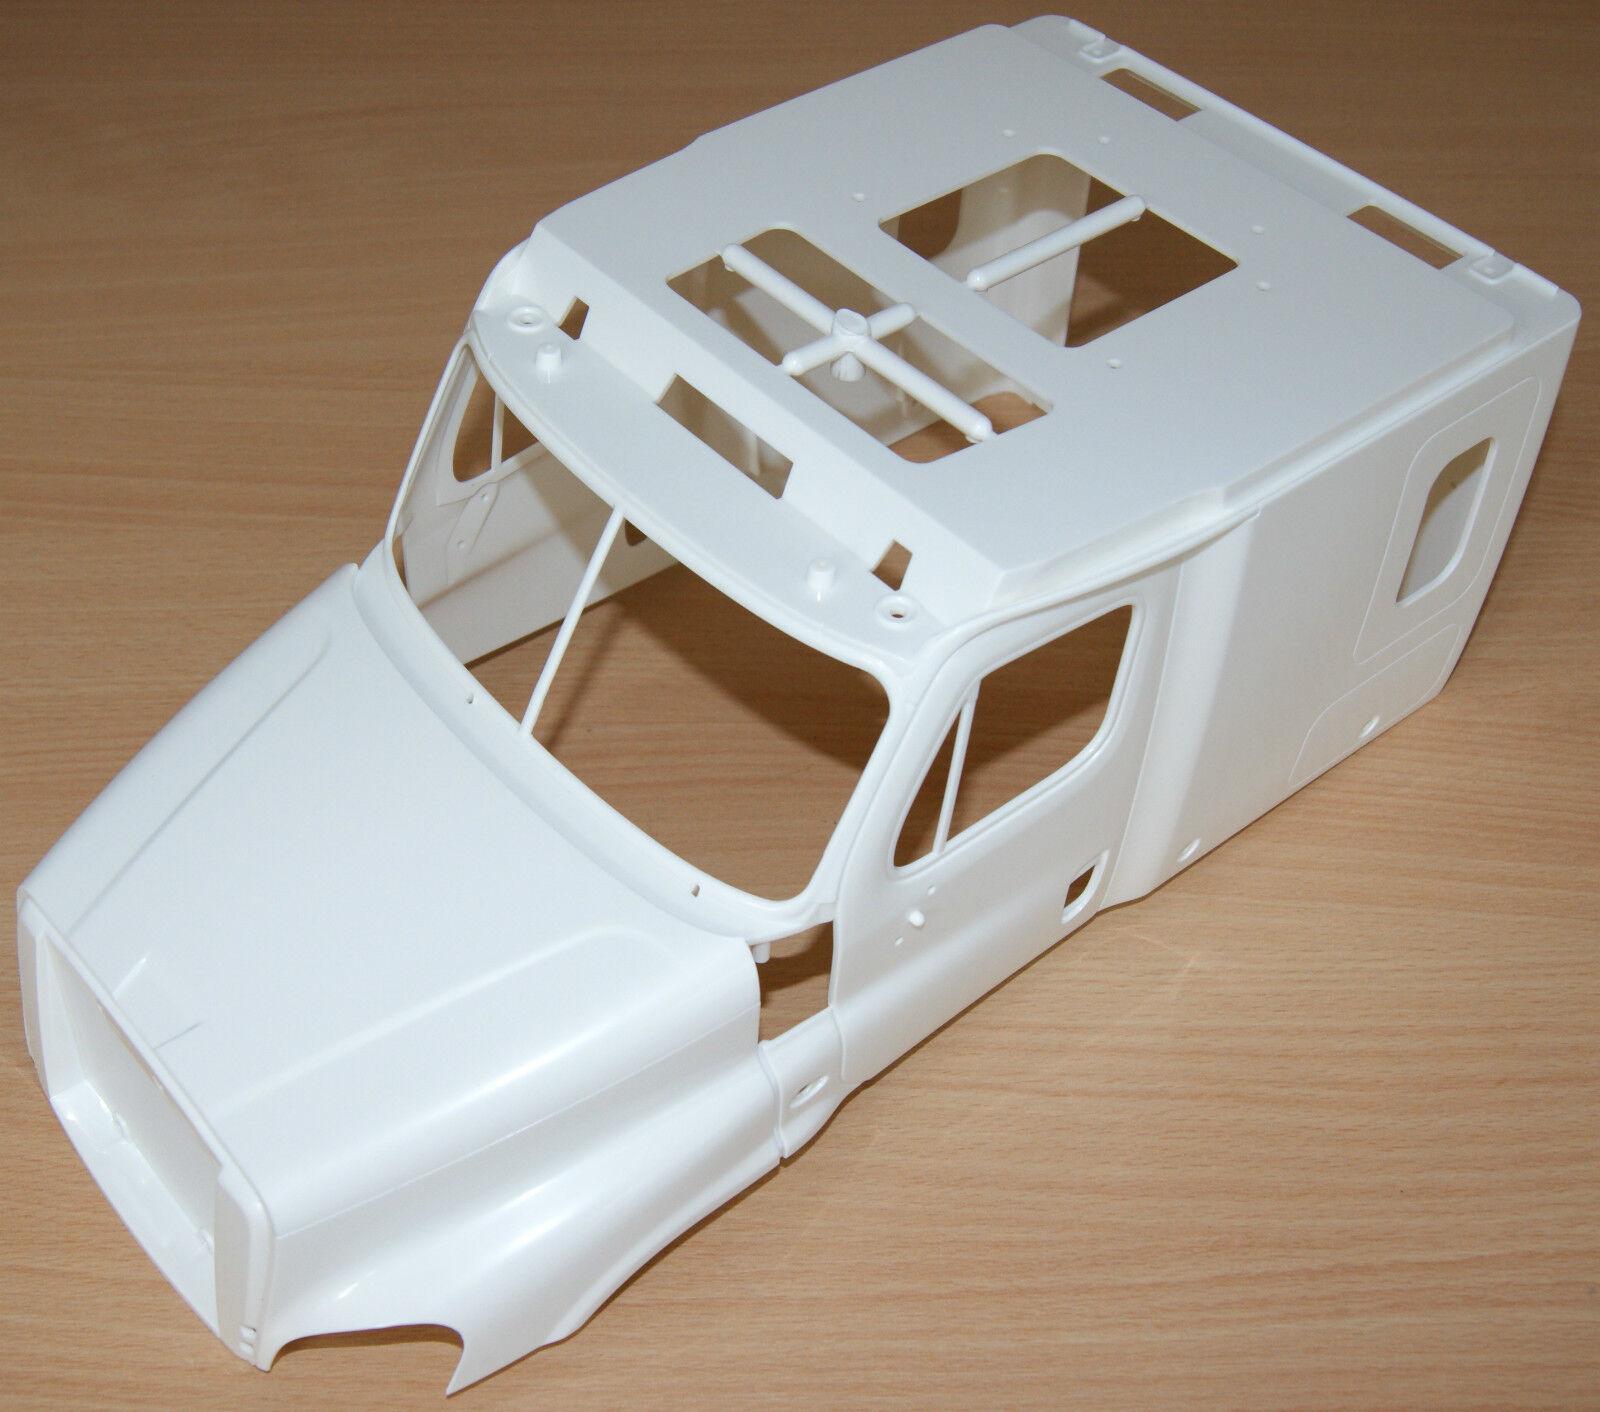 Tamiya 56340 Freightliner Cascadia Evolution, 9335718 19335718 Body Shell CAB